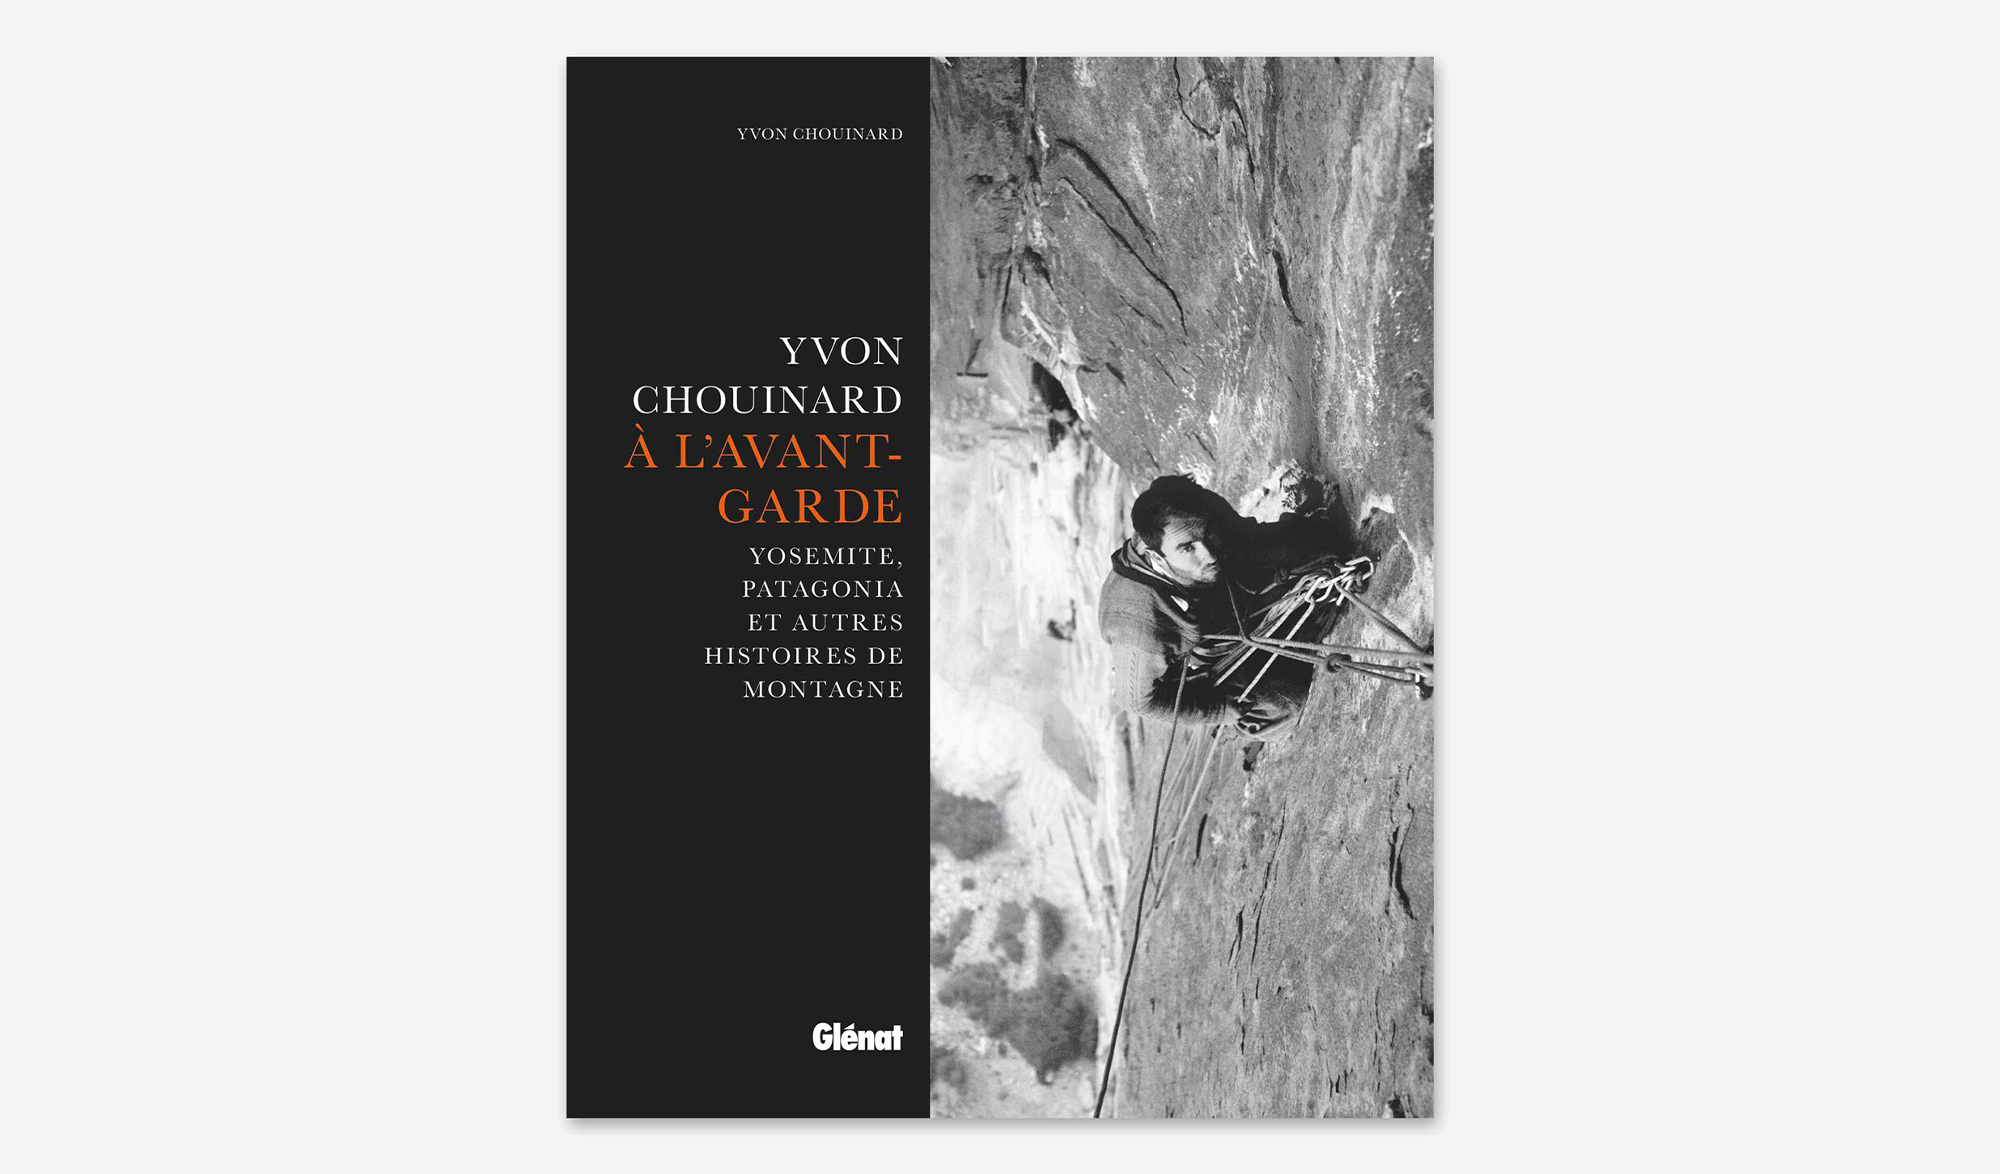 Yvon Chouinard - à l'avant garde